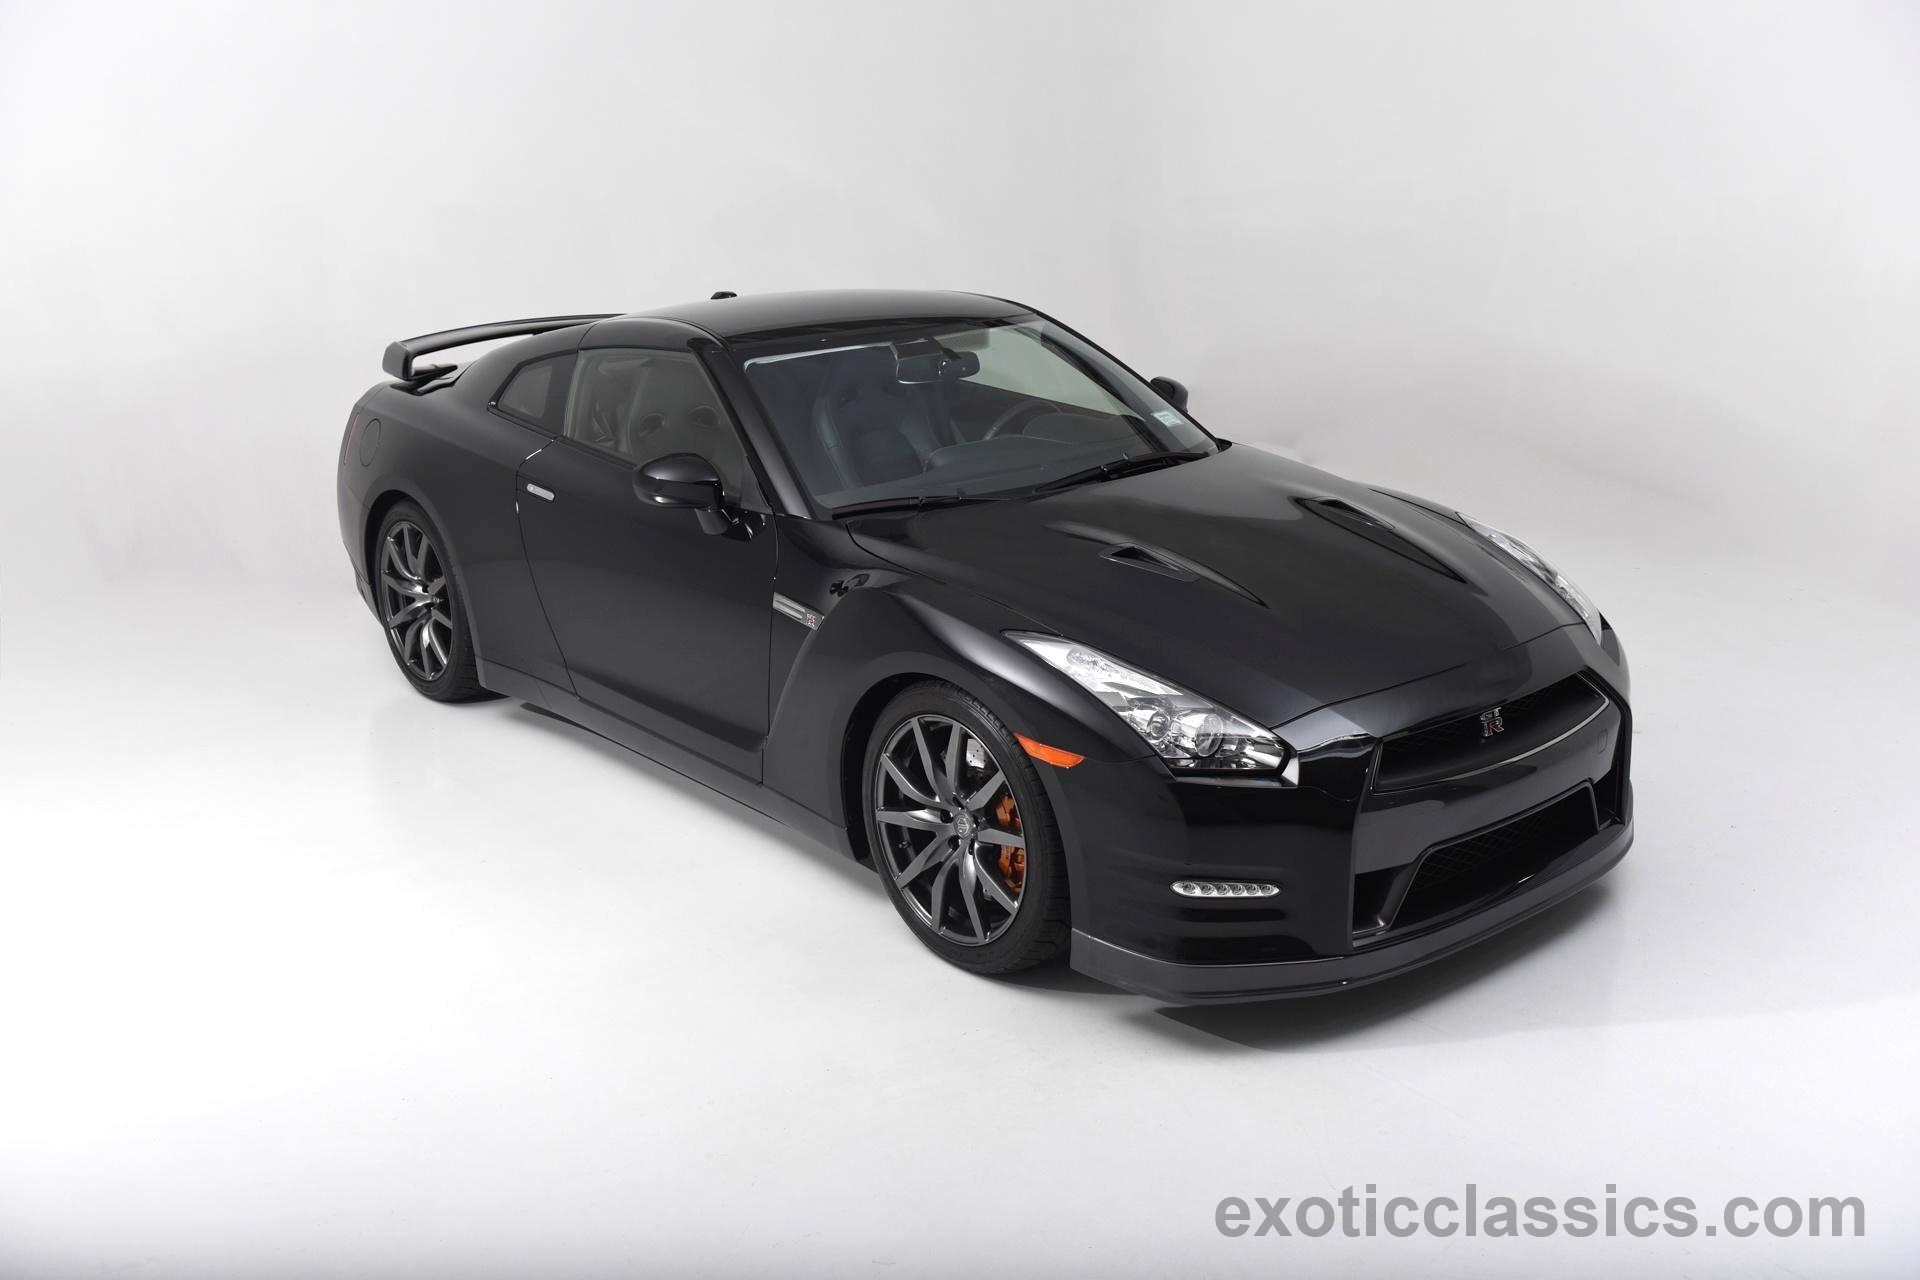 2014 Nissan Gt R Premium Exotic Classic Car Dealership